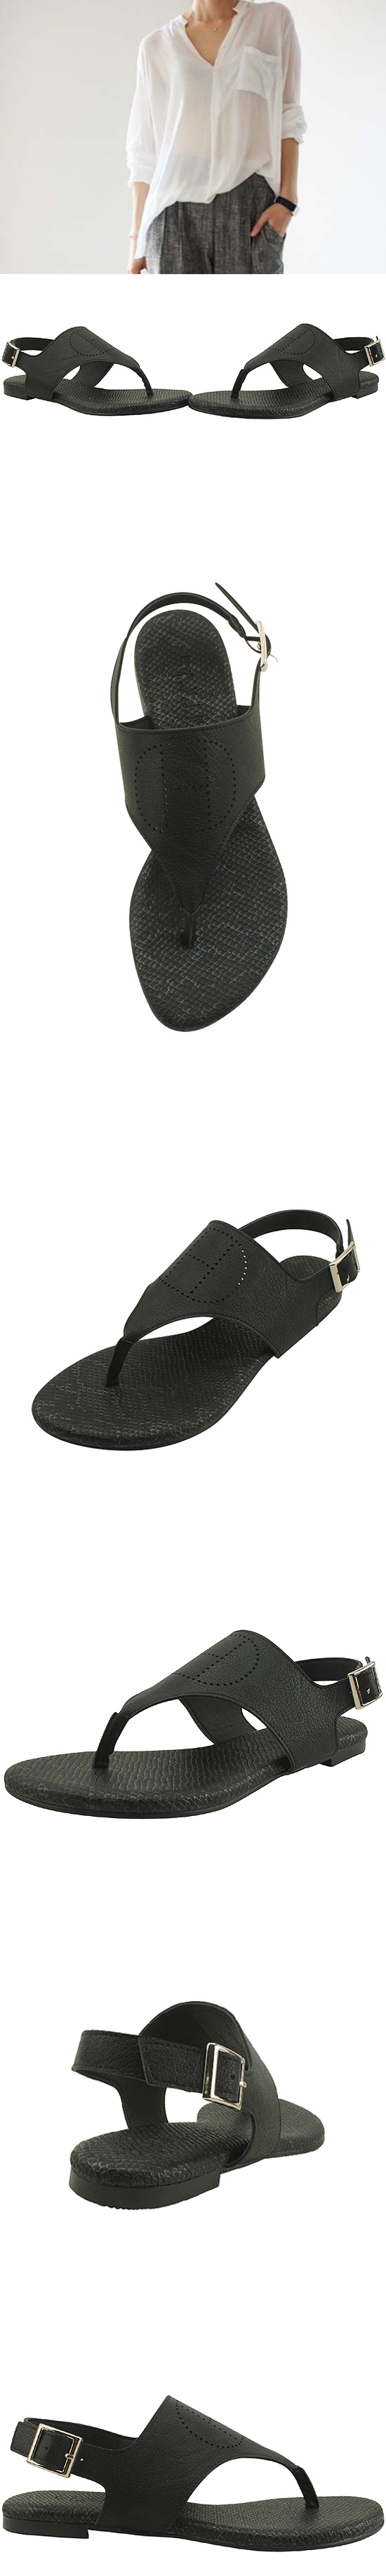 H flip flop sandals black